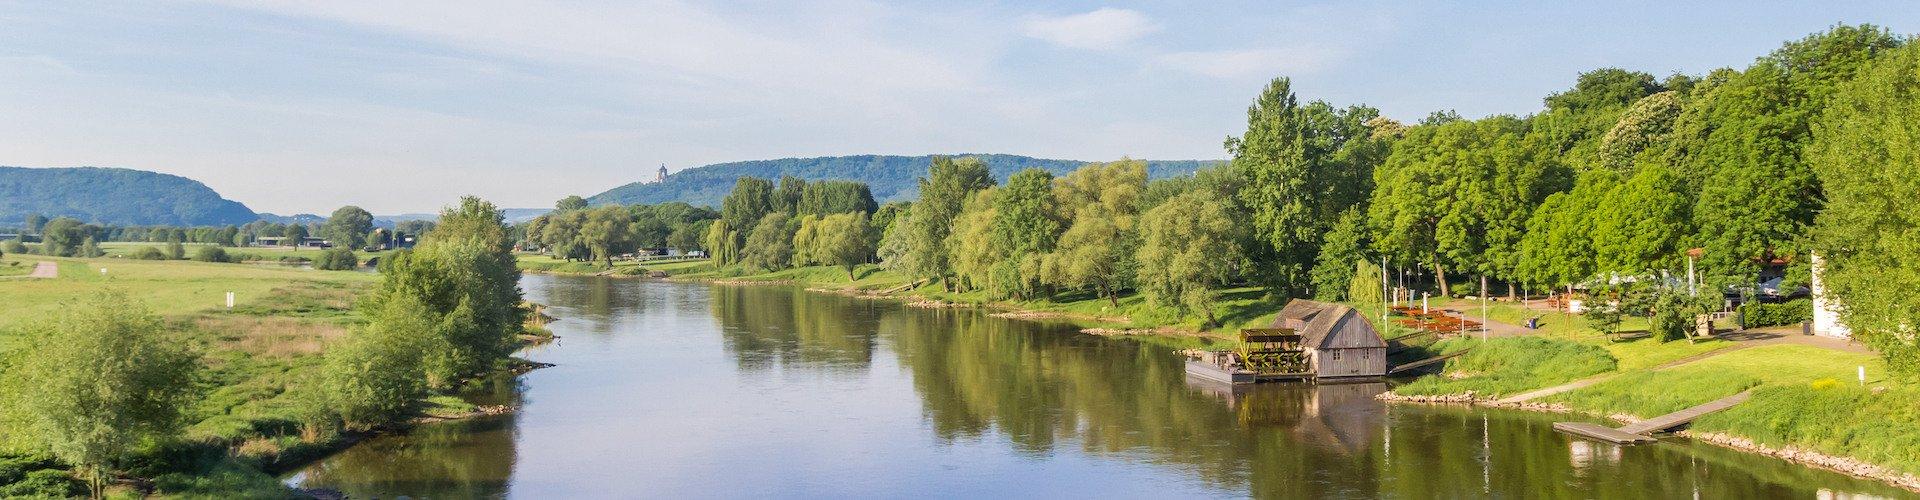 Familienurlaub im Weserbergland